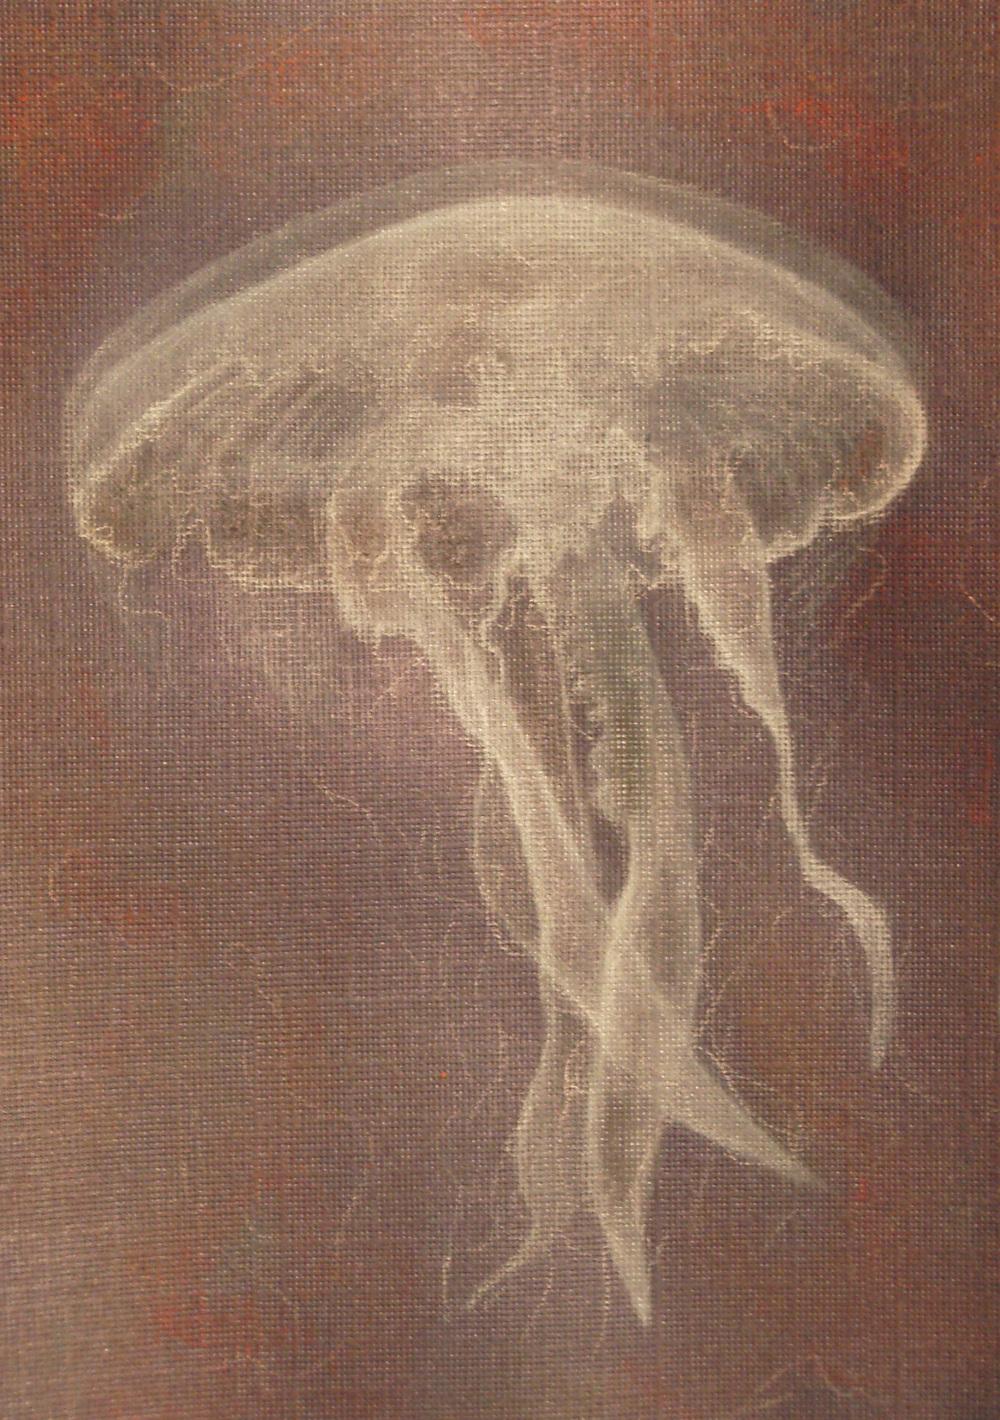 rowe_jellyfish.JPG